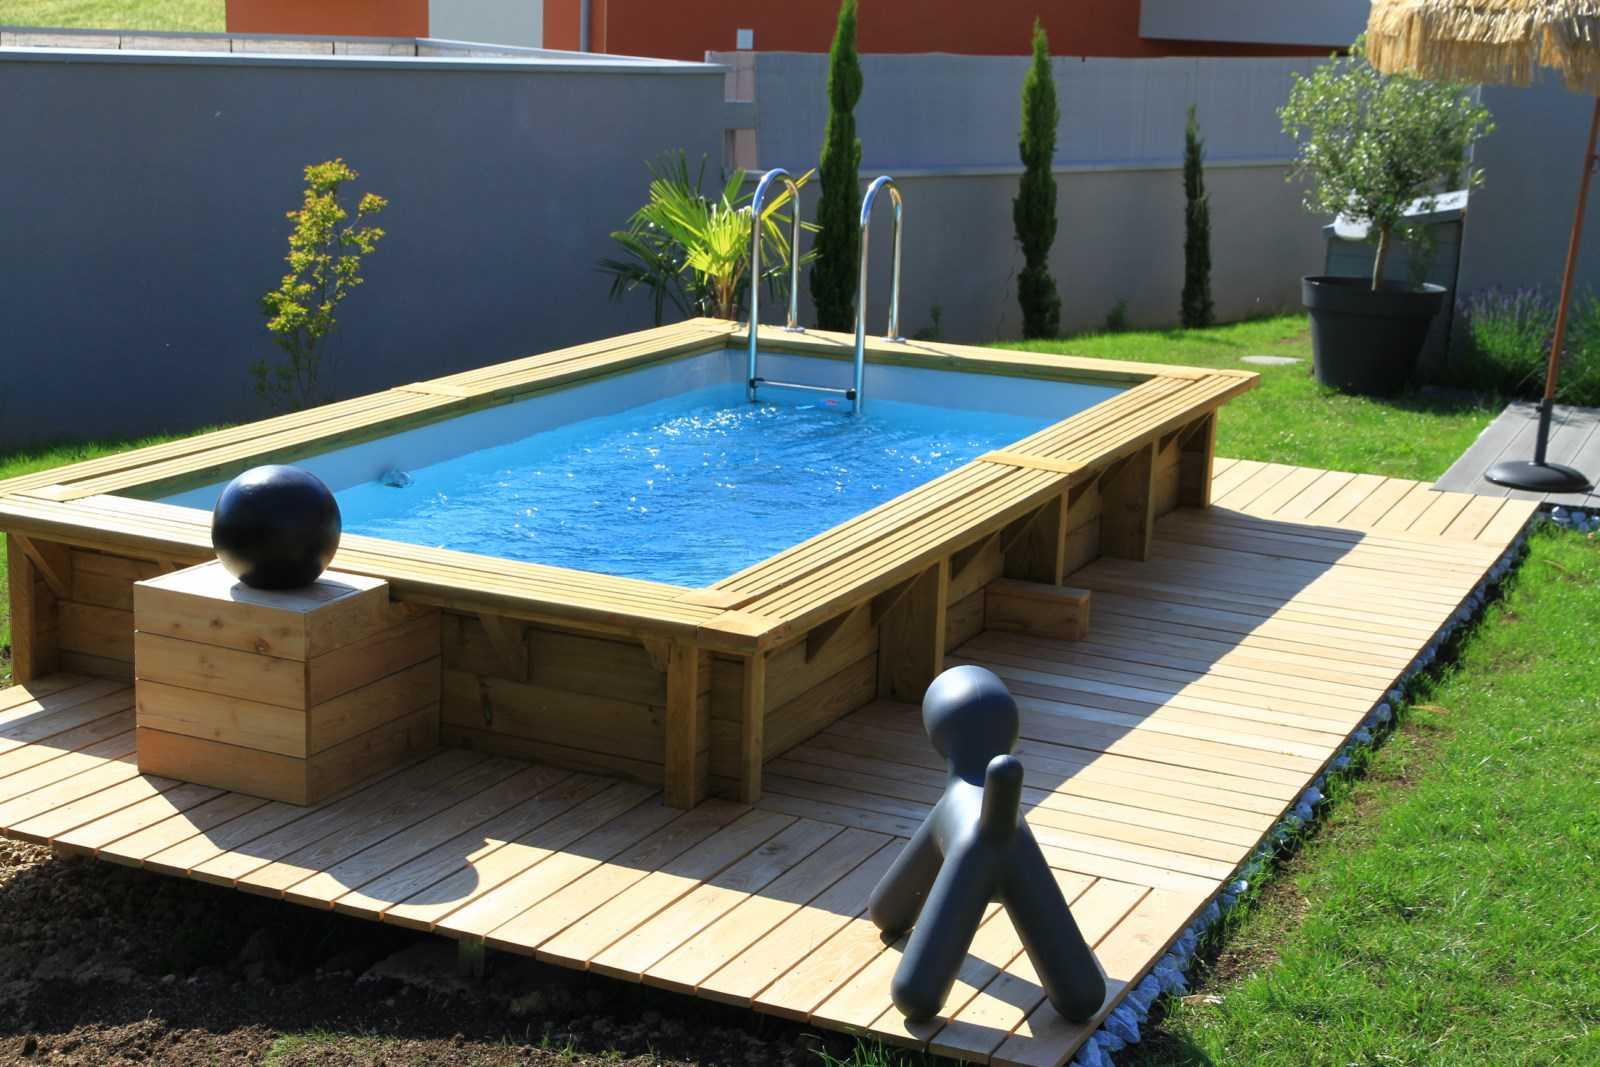 Amenagement Jardin Avec Piscine Bois amenagement jardin piscine amenagement piscine bois - idees